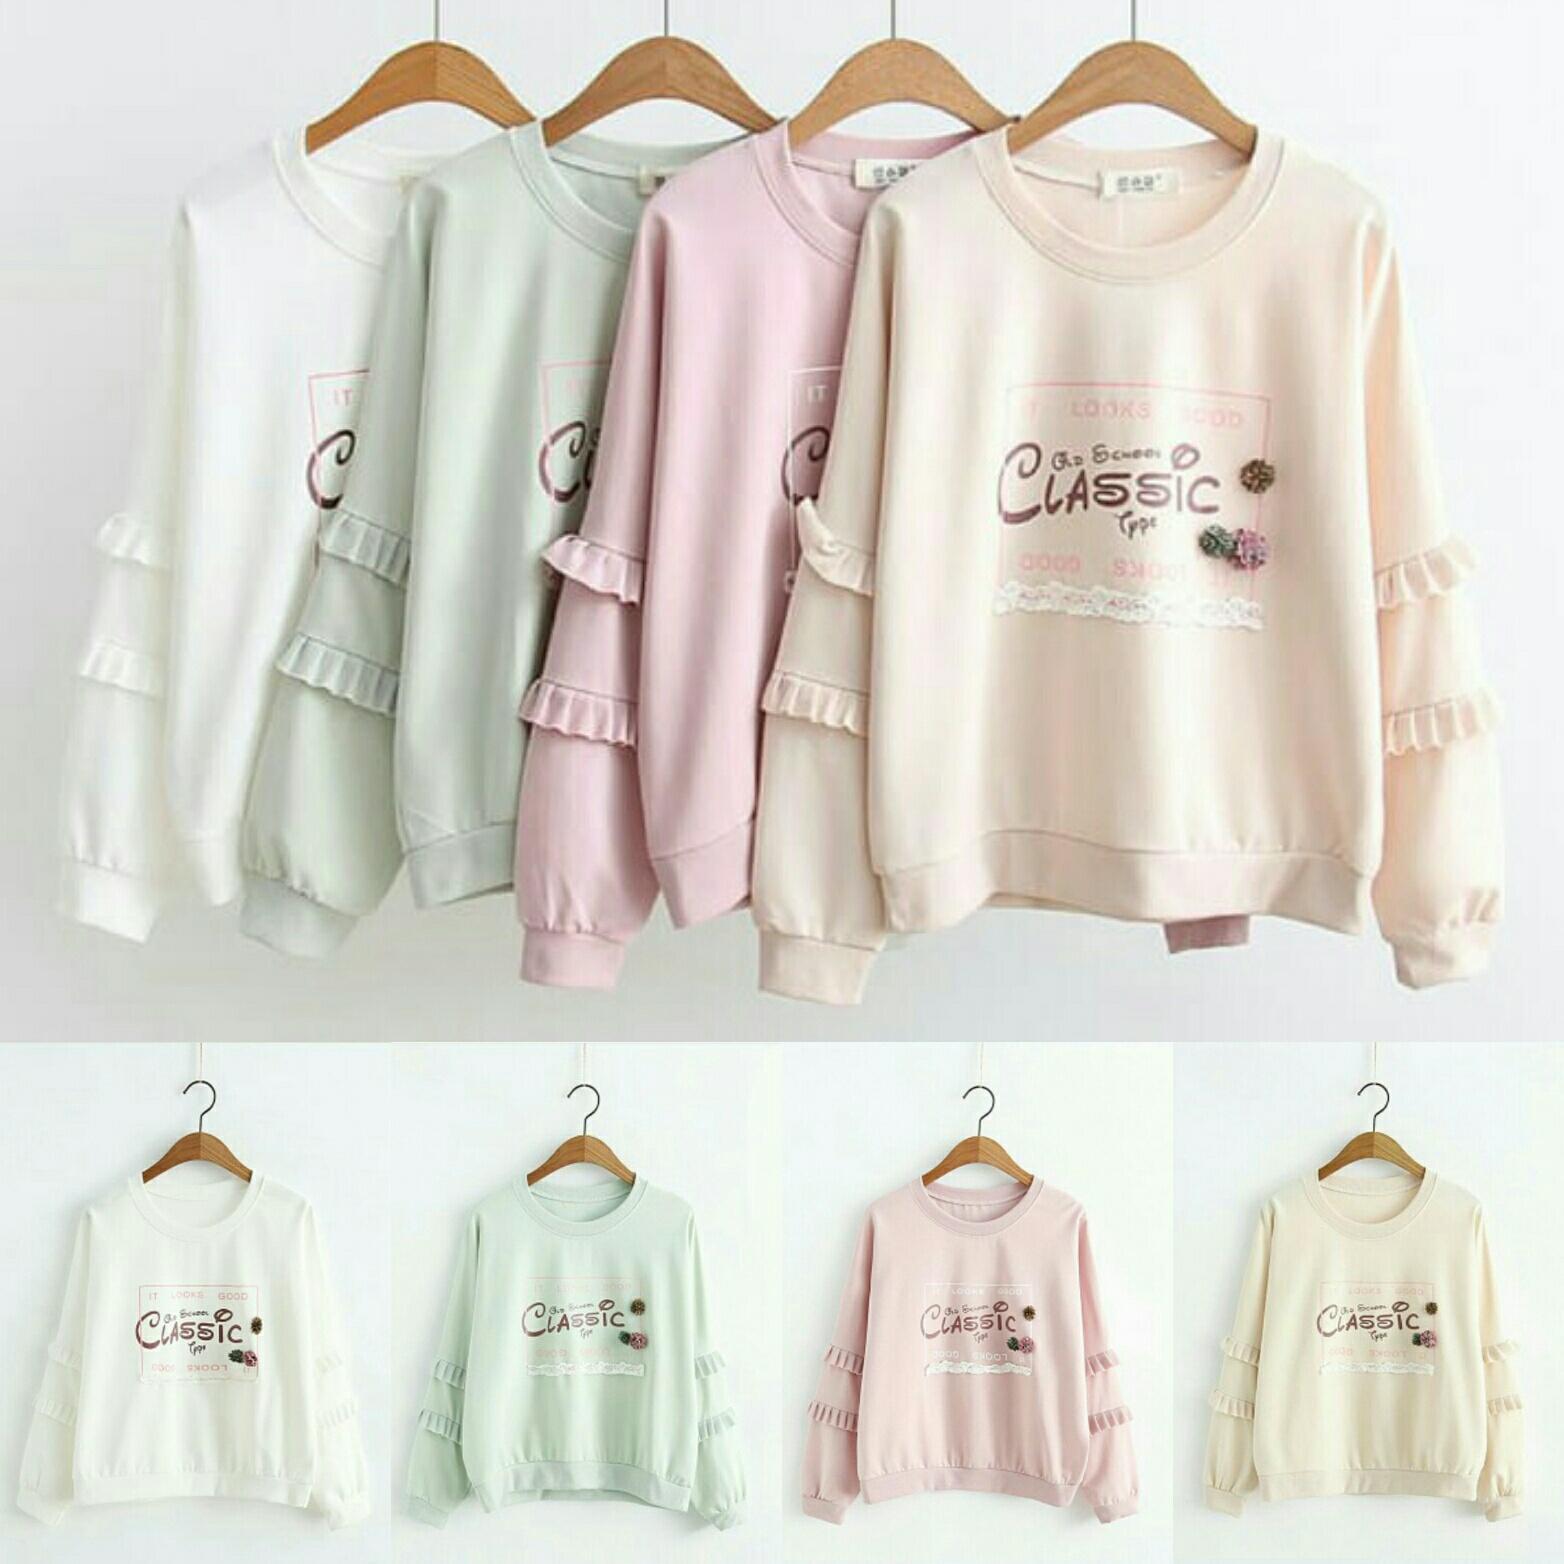 Fitur The Most Sweater Maroon Navy Hitam Harajuku Hangat Basic Oblong Polos Jc Classic Panjang Kaos Wanita Trendy